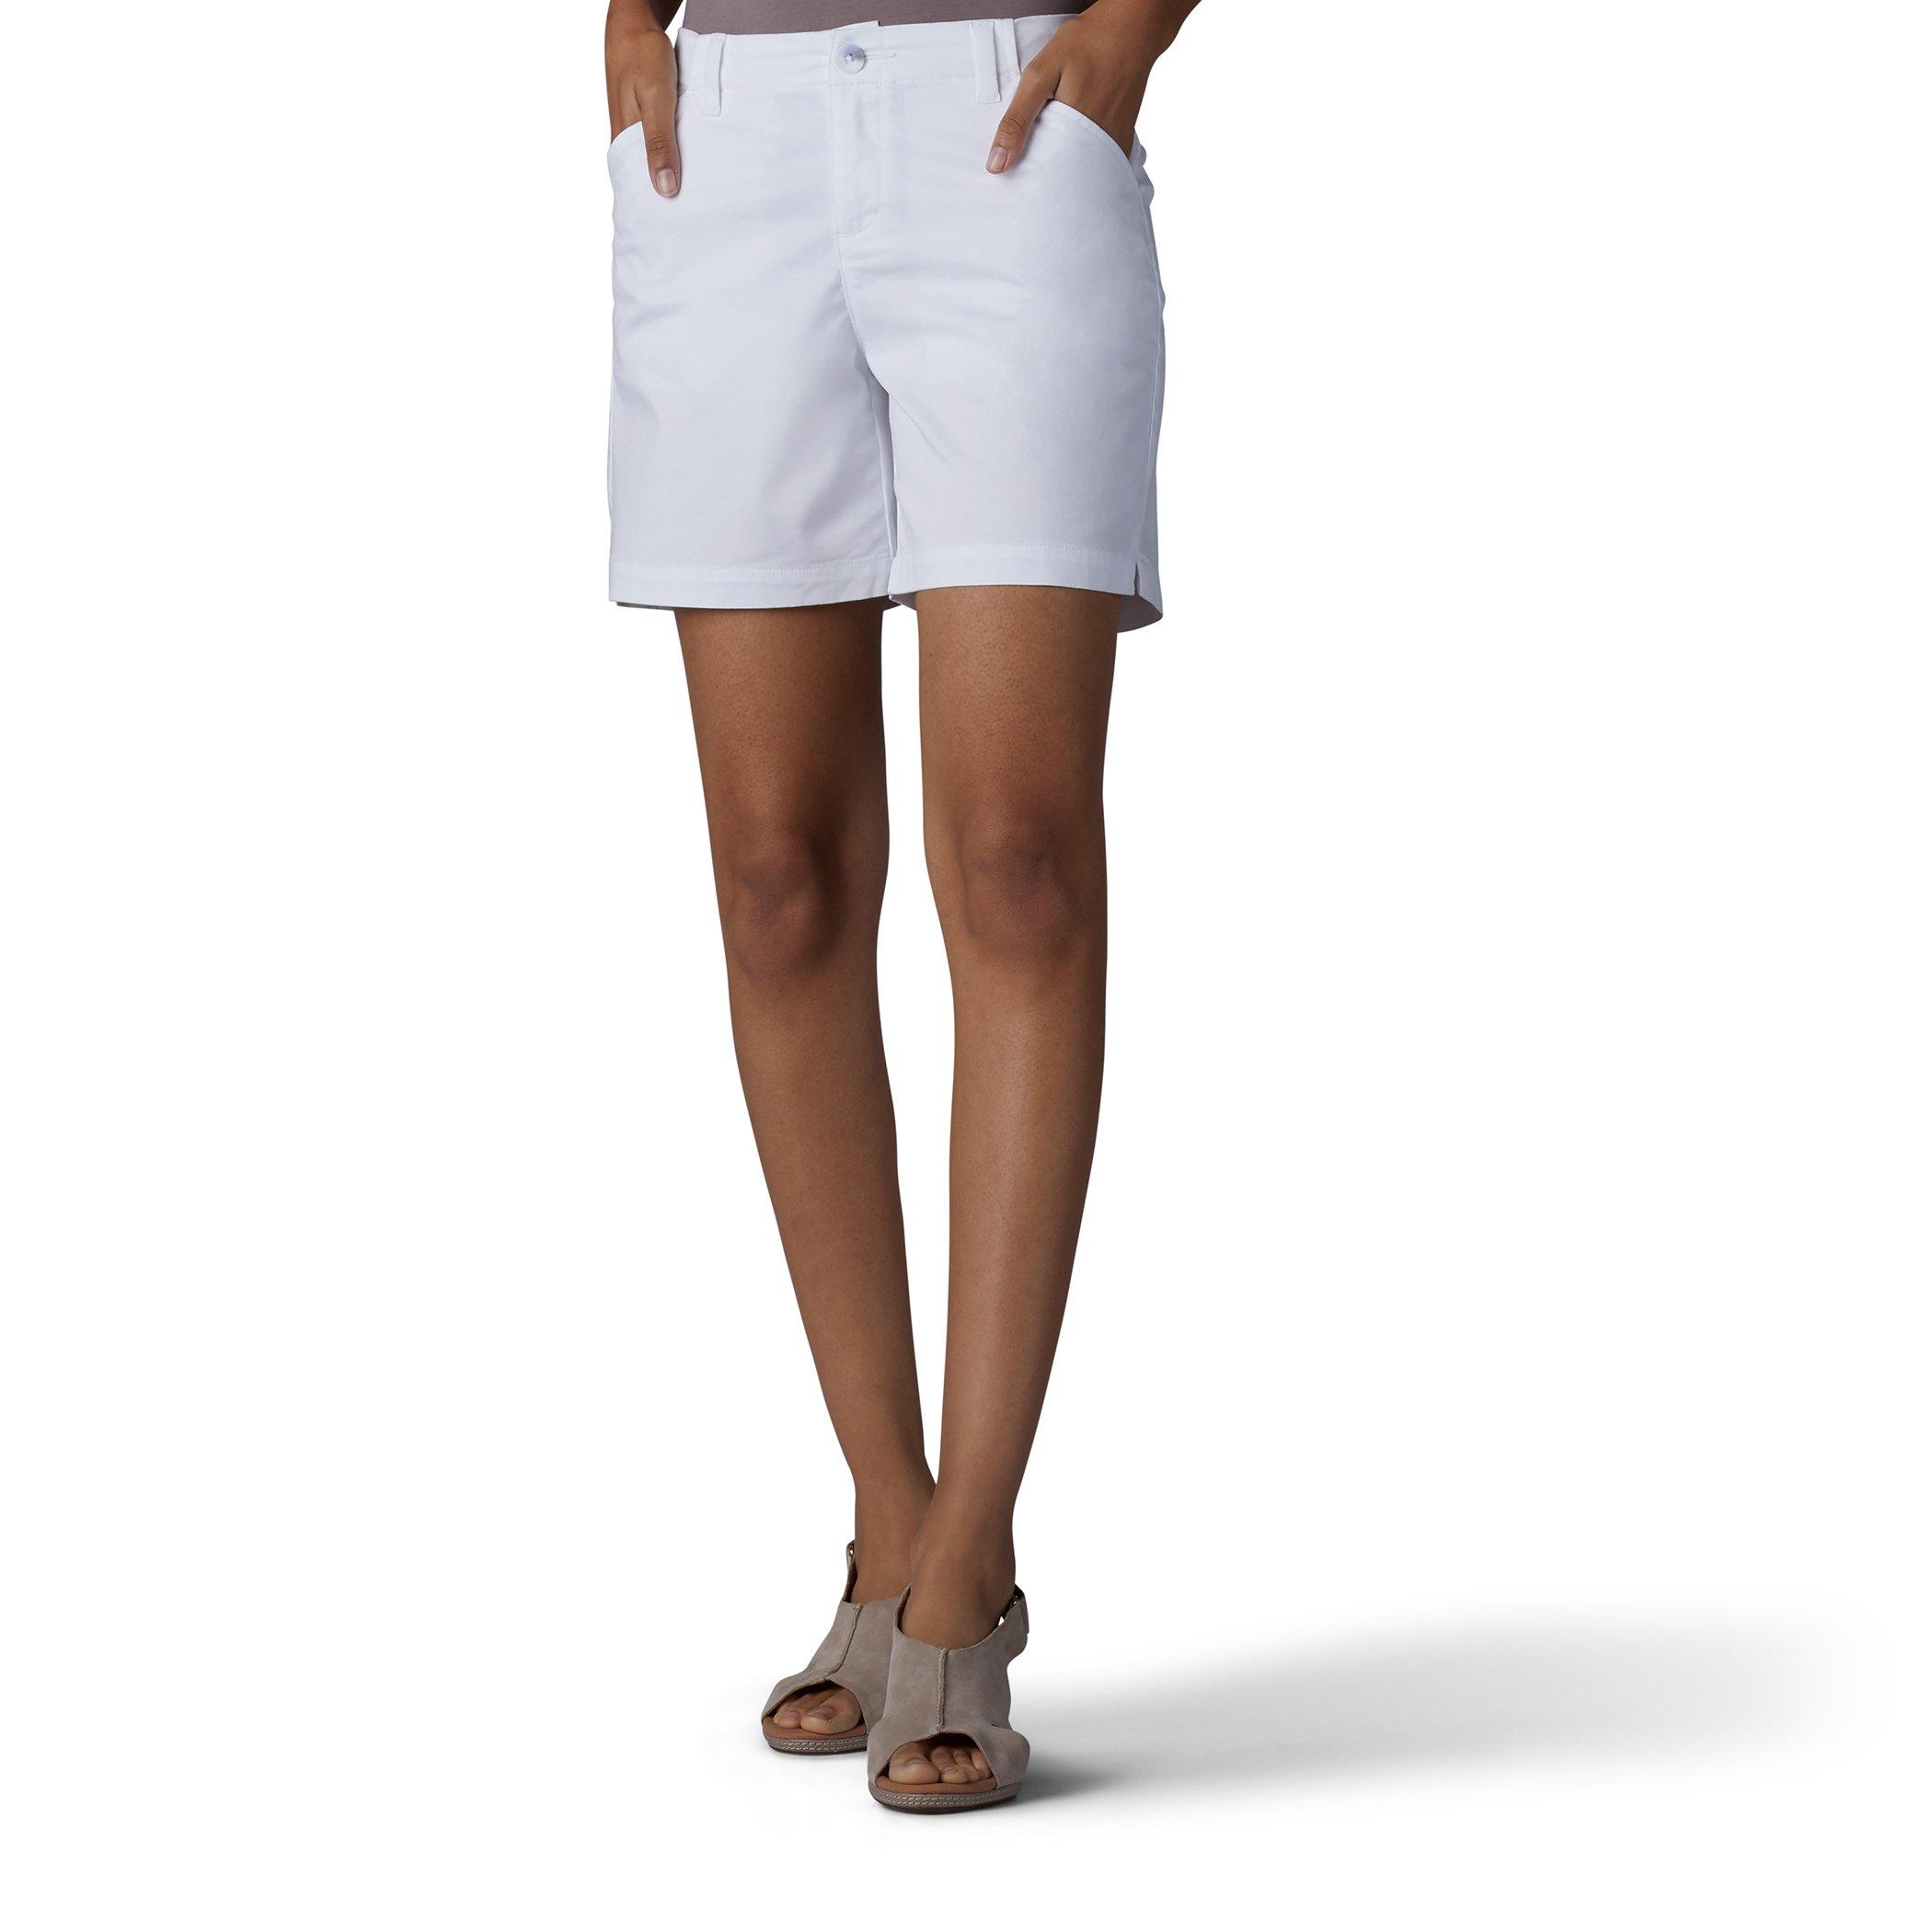 LEE Women's Straight Fit Tailored Chino Short, White, 12